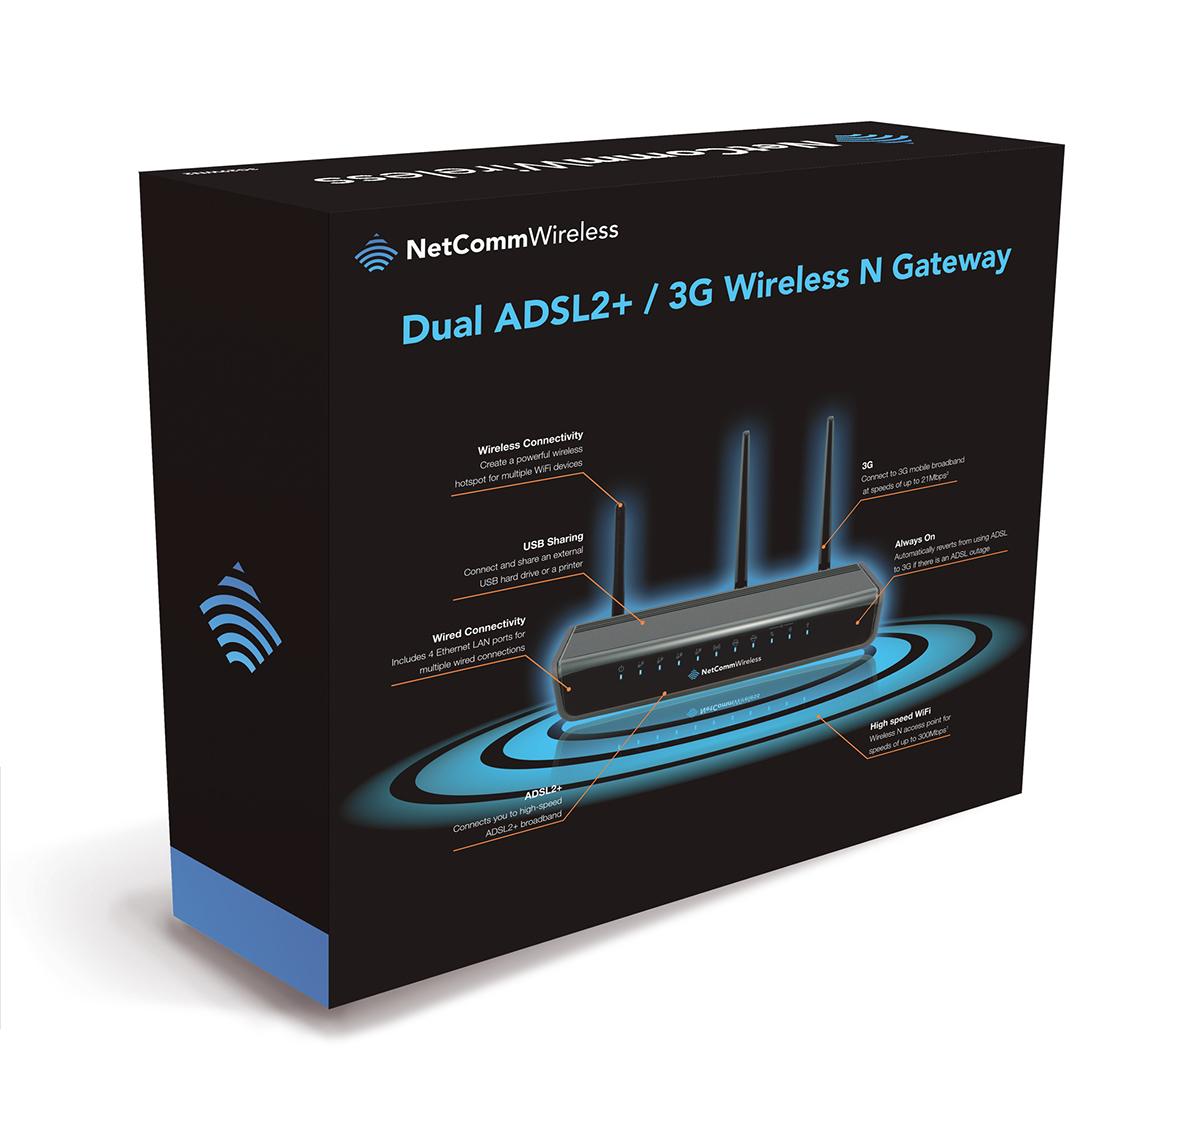 NetComm Wireless Consumer Packaging 2013 on Behance